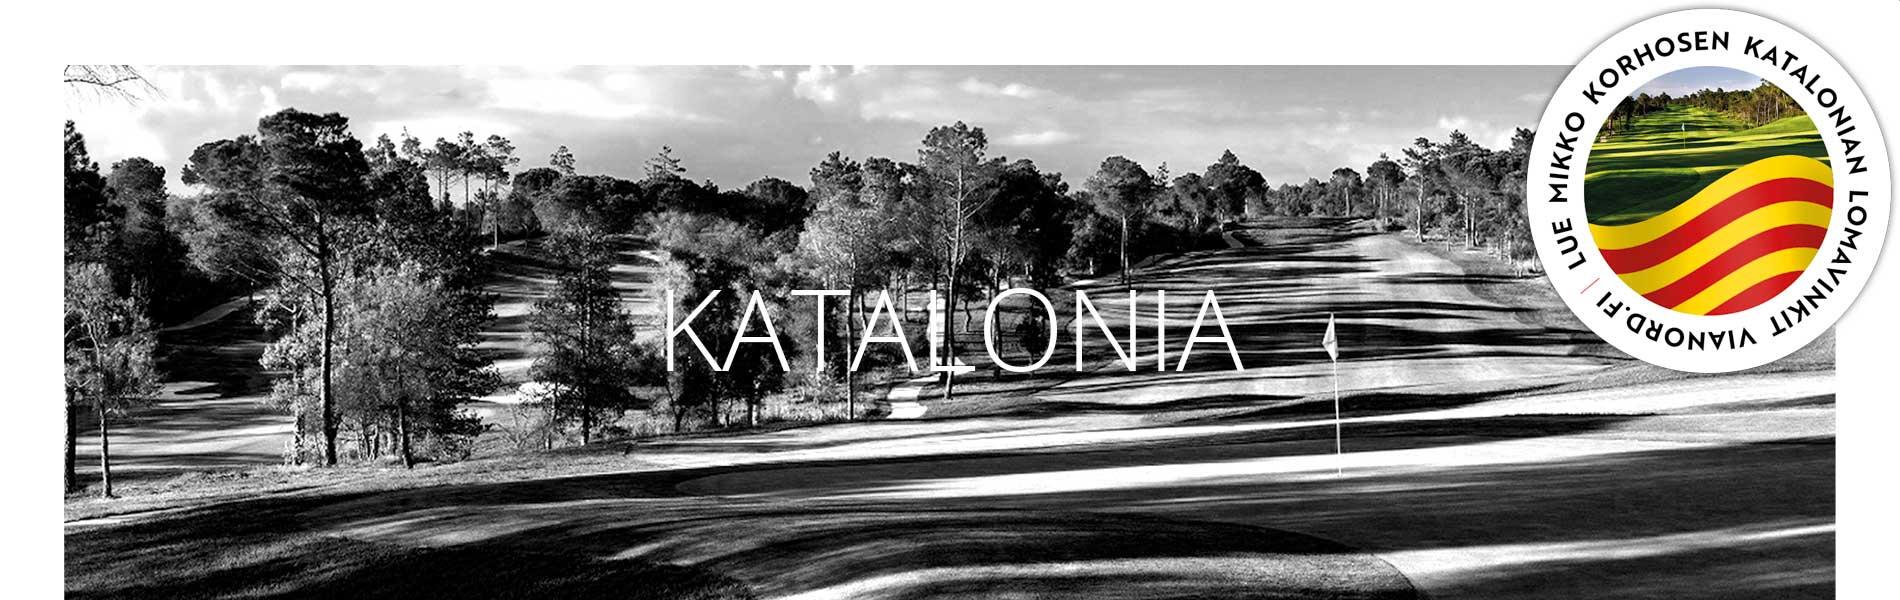 vianord_katalonia_NEW